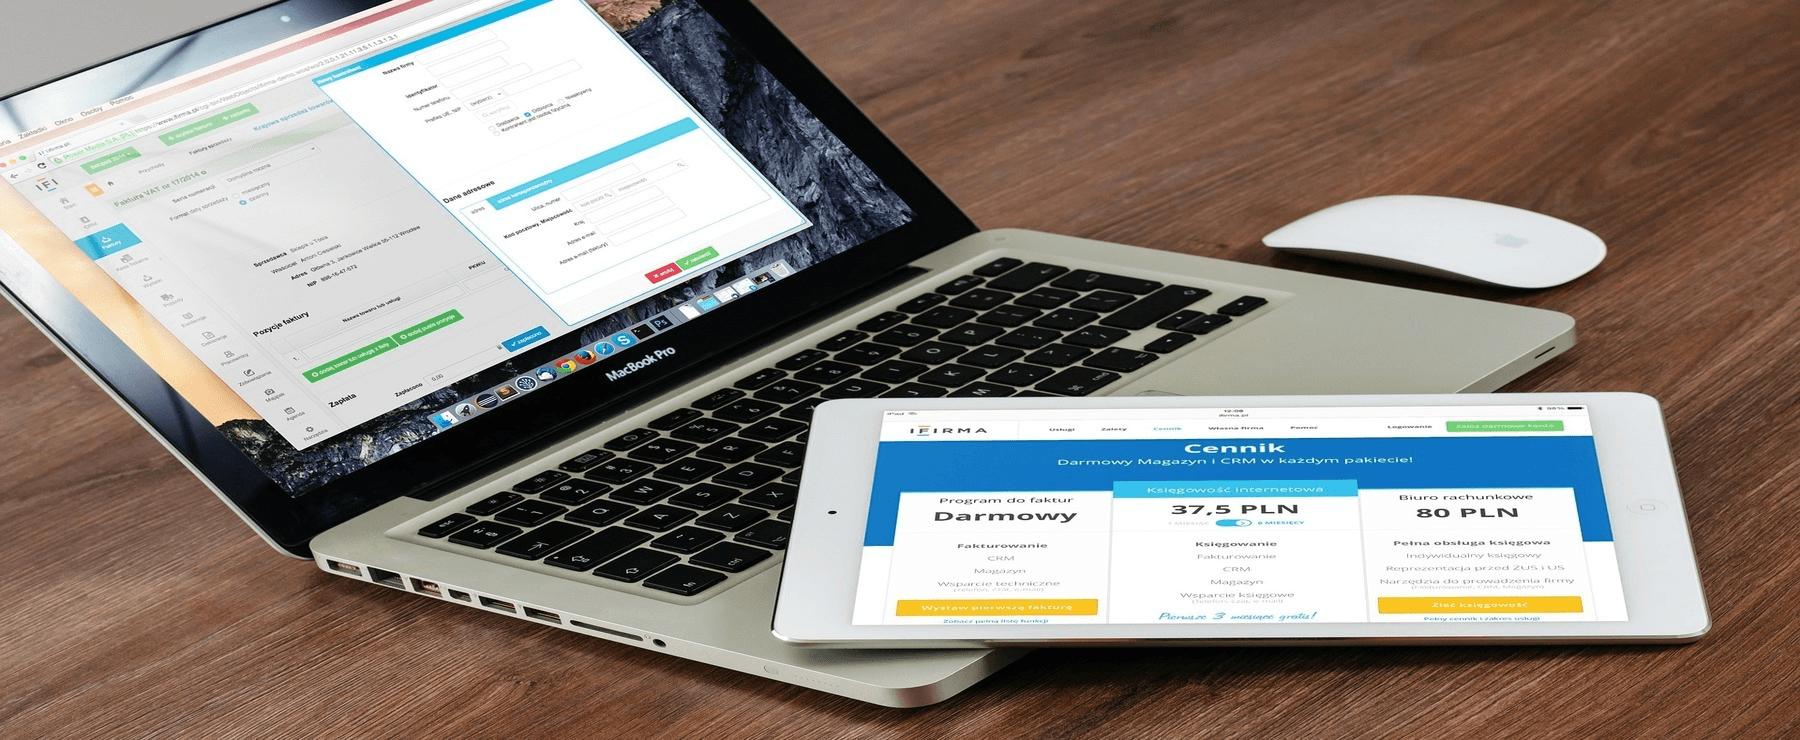 Como mantener tu sitio web actualizado